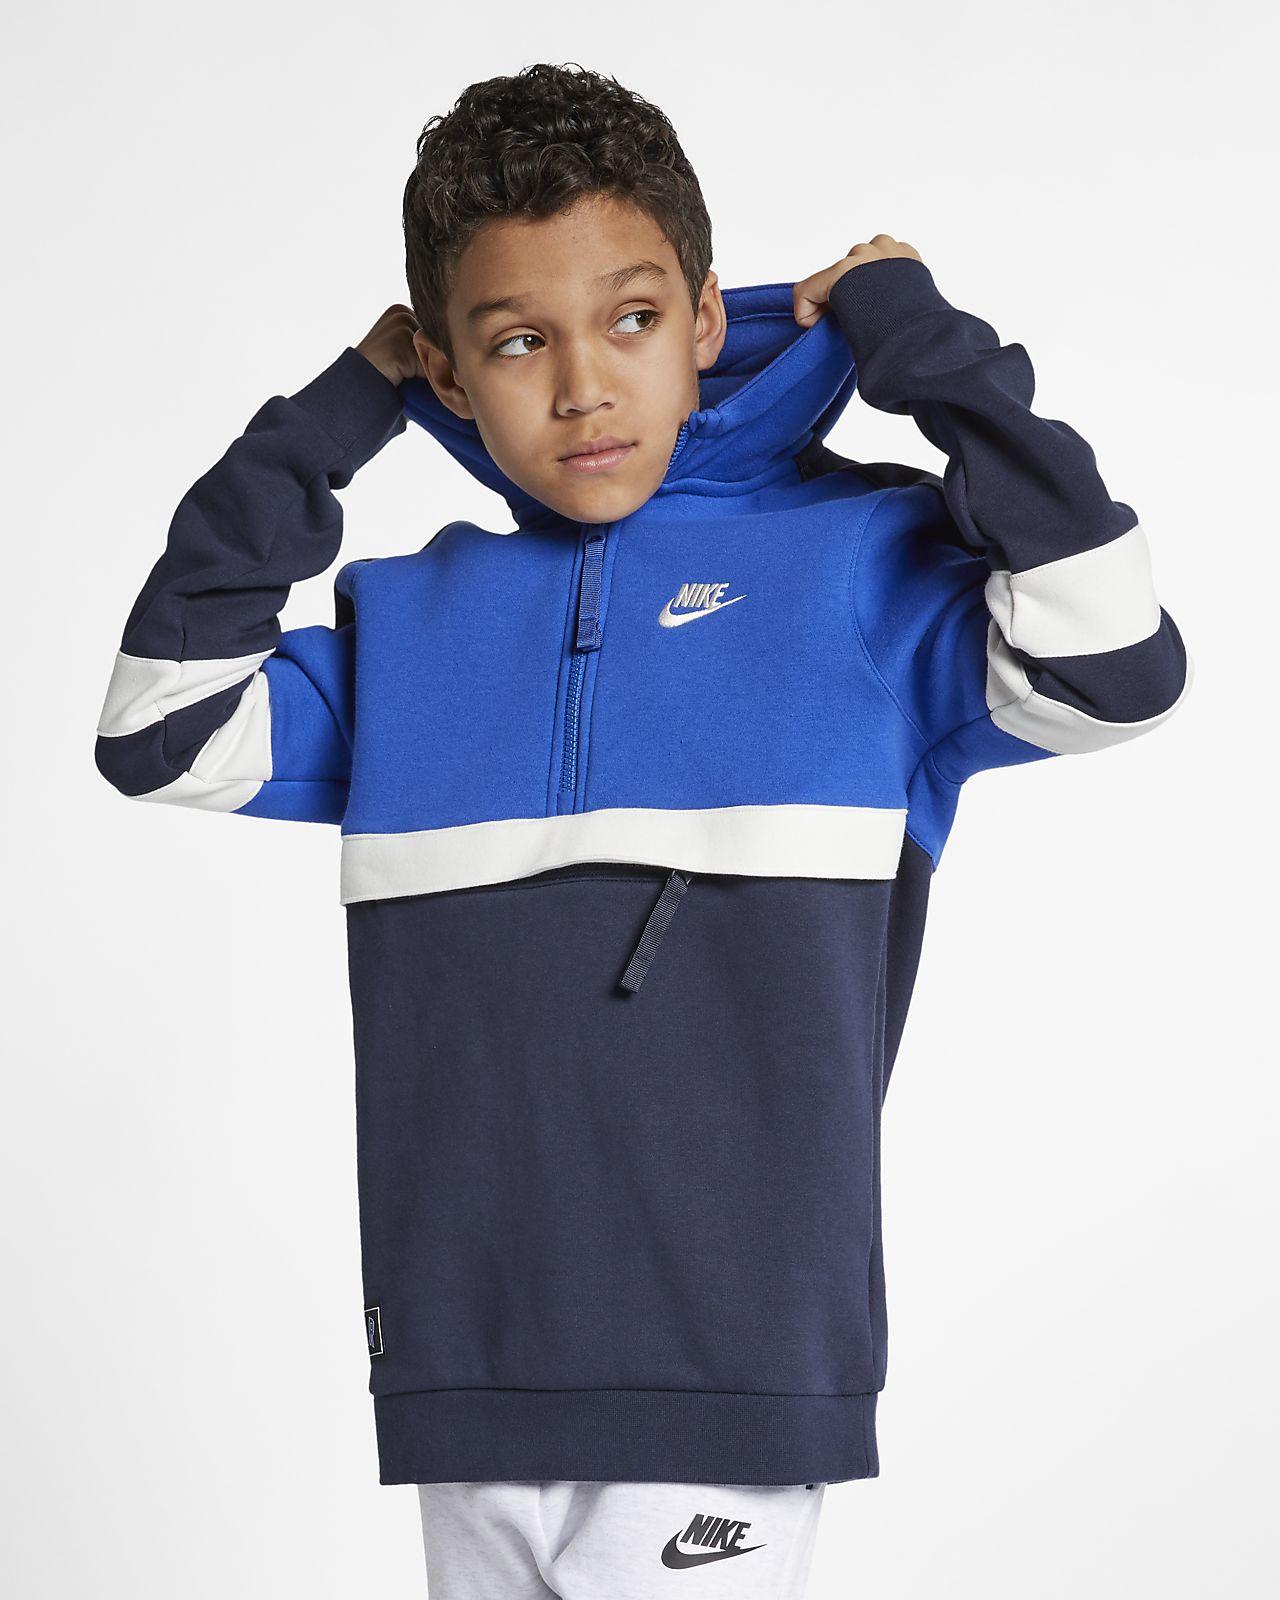 Nike Sportswear Sudadera con capucha y media cremallera - Niño/a